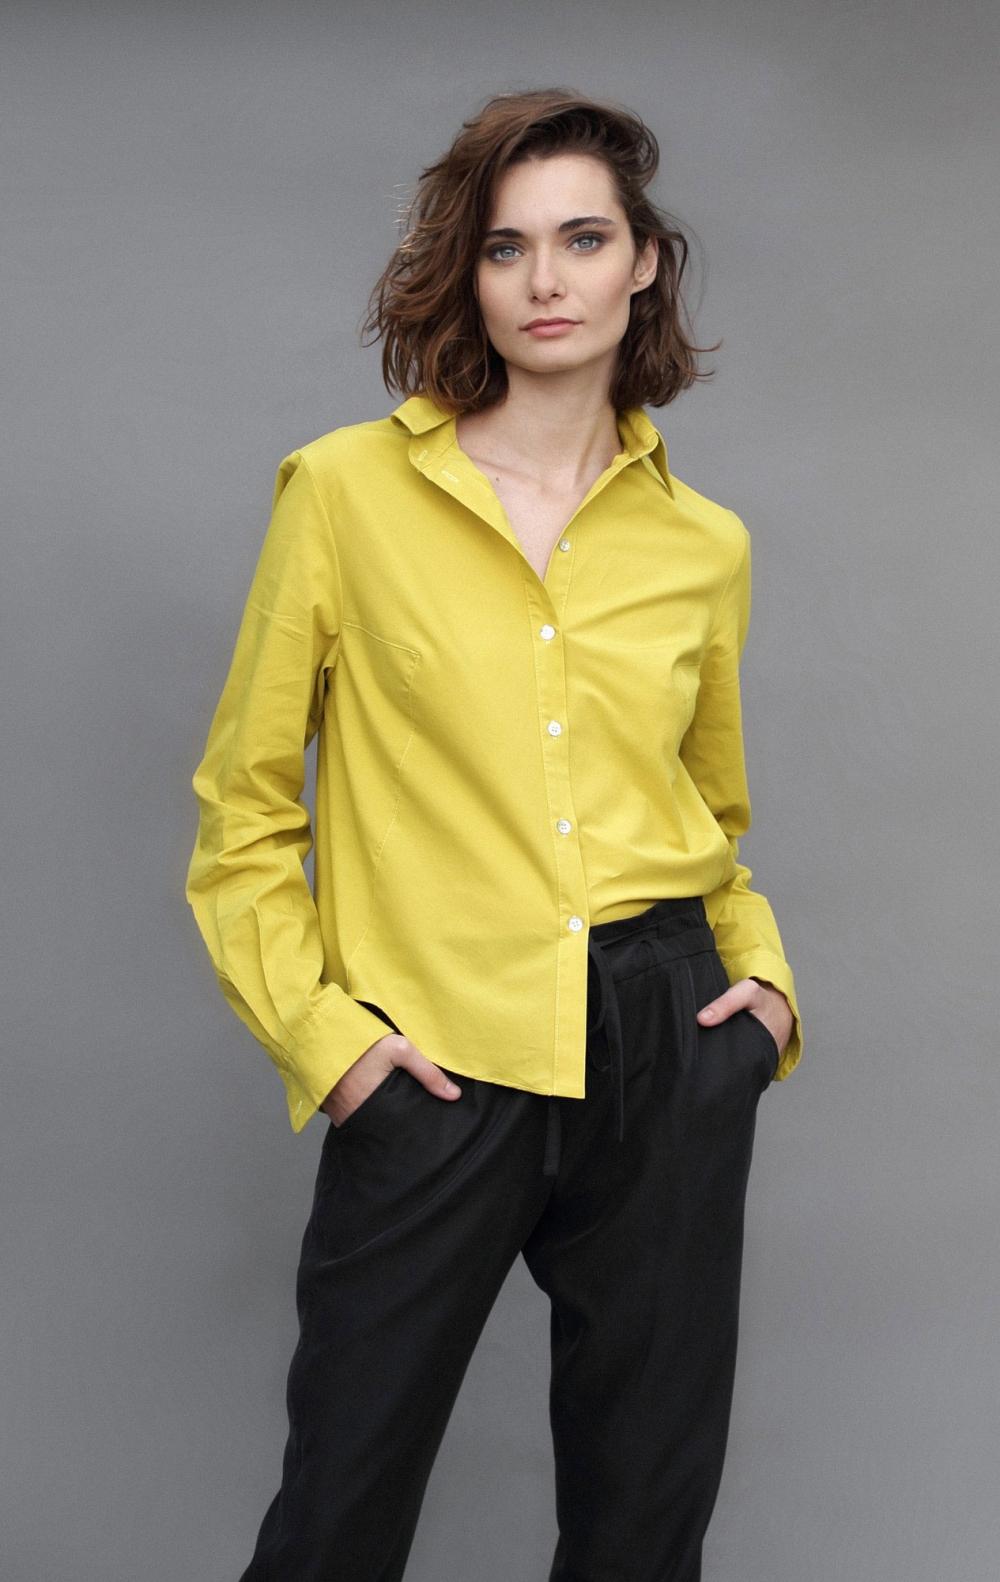 Camisa Aspesi - Foto 1